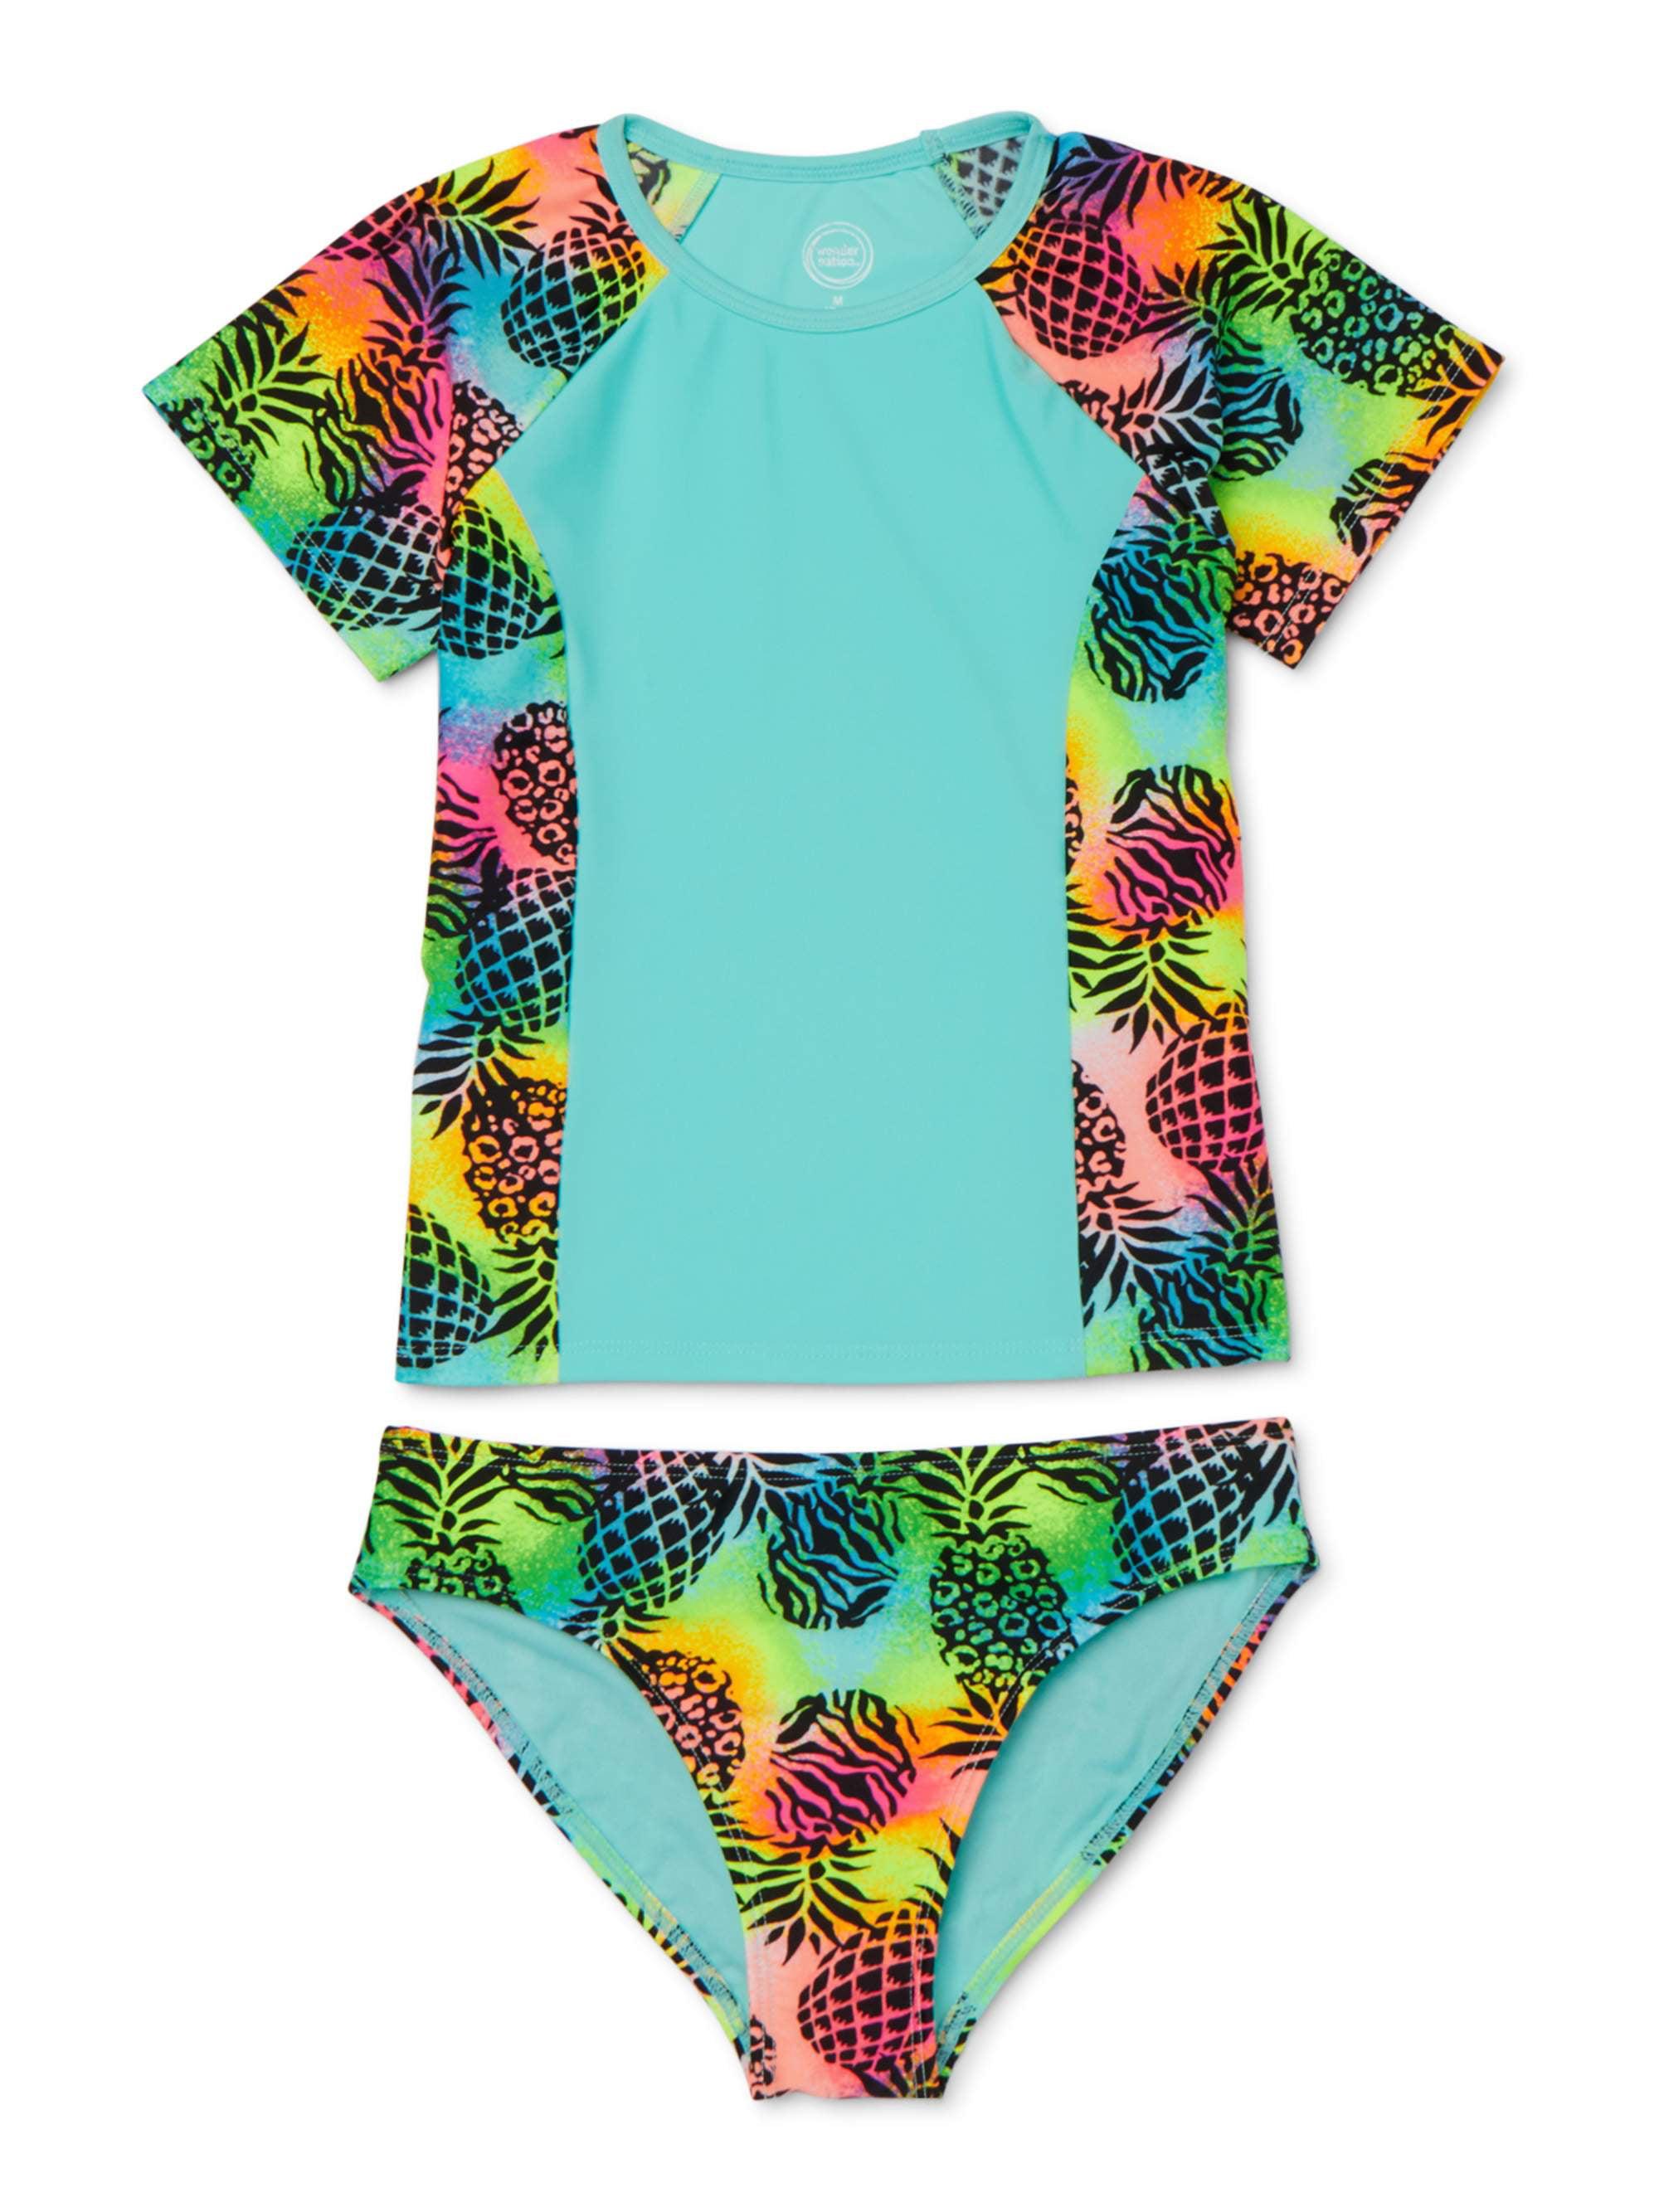 Baby//Toddler Girl Swimsuit Rashguard Bikini Beach Striped Stitching One-Piece Swimsuit Swimwear Set